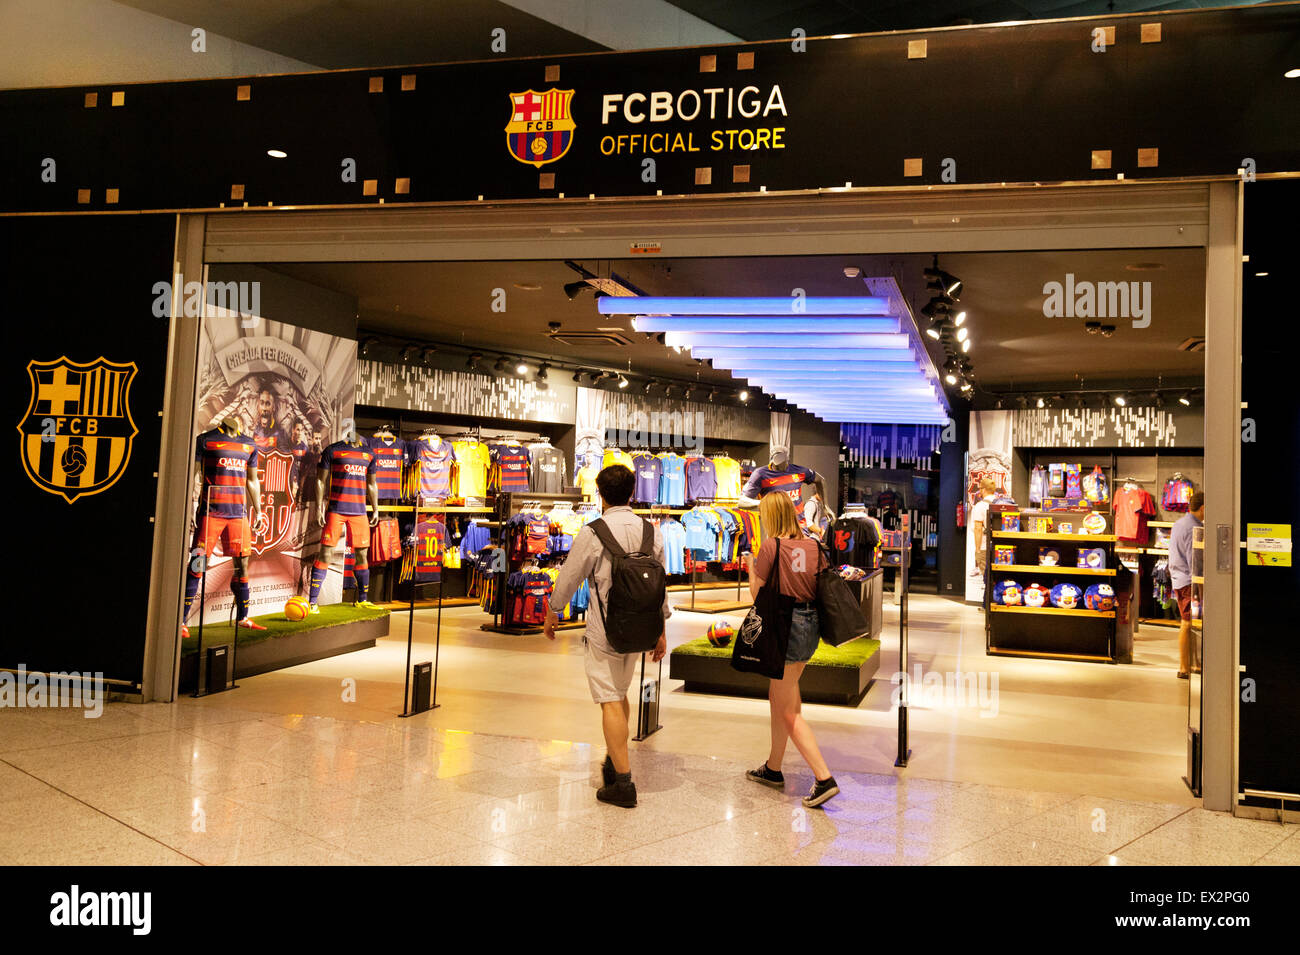 fc barcelona handbol shop